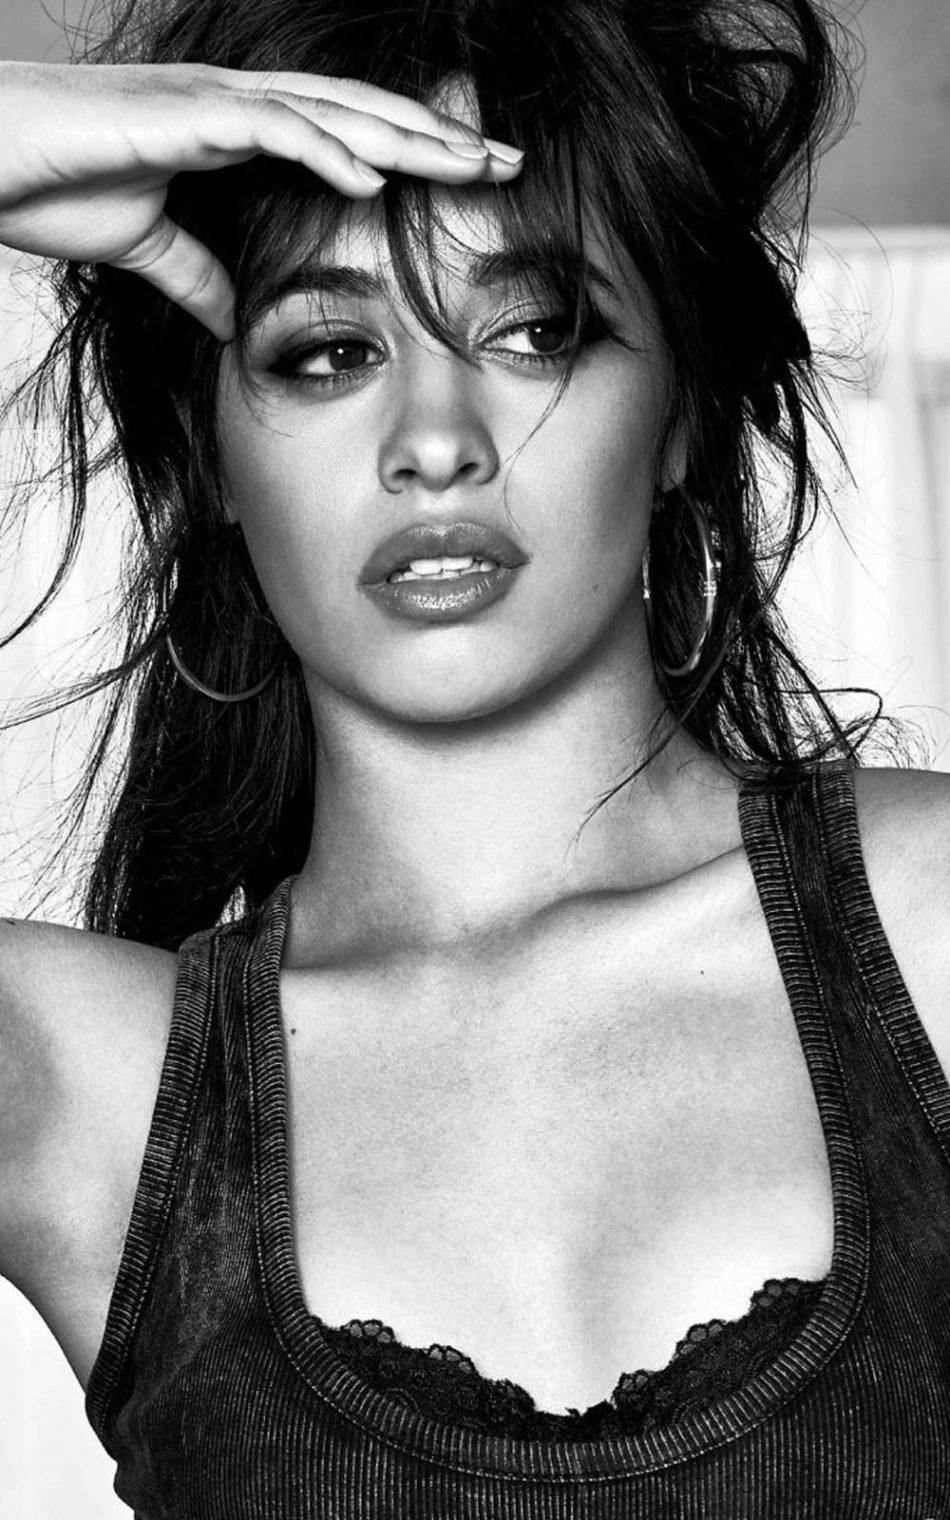 Camila Cabello Bw Hot Photoshoot 4k Ultra Hd Mobile Wallpaper Portrait Photography Women Photography Women Beautiful Girl Image